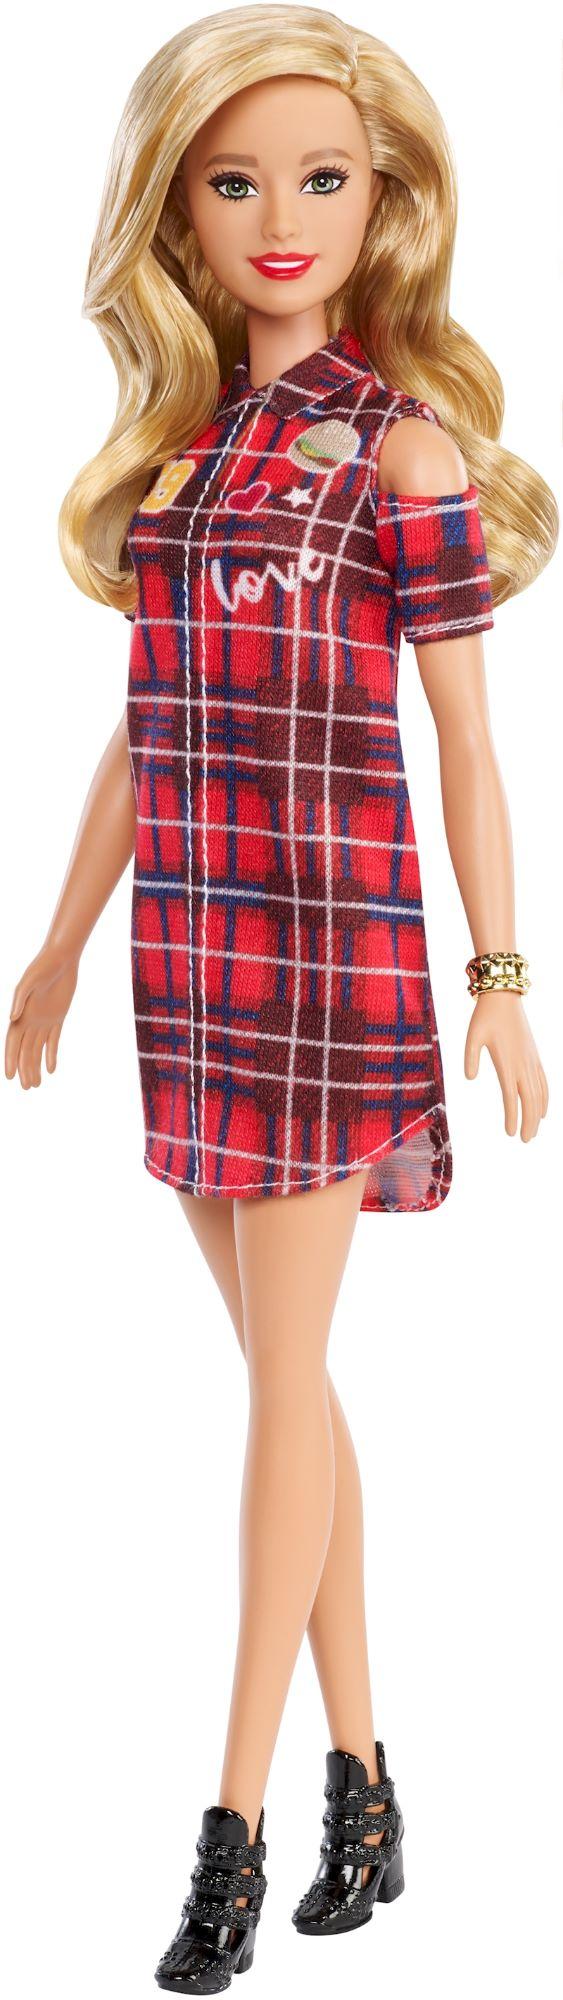 Barbie Fashionistas - 113